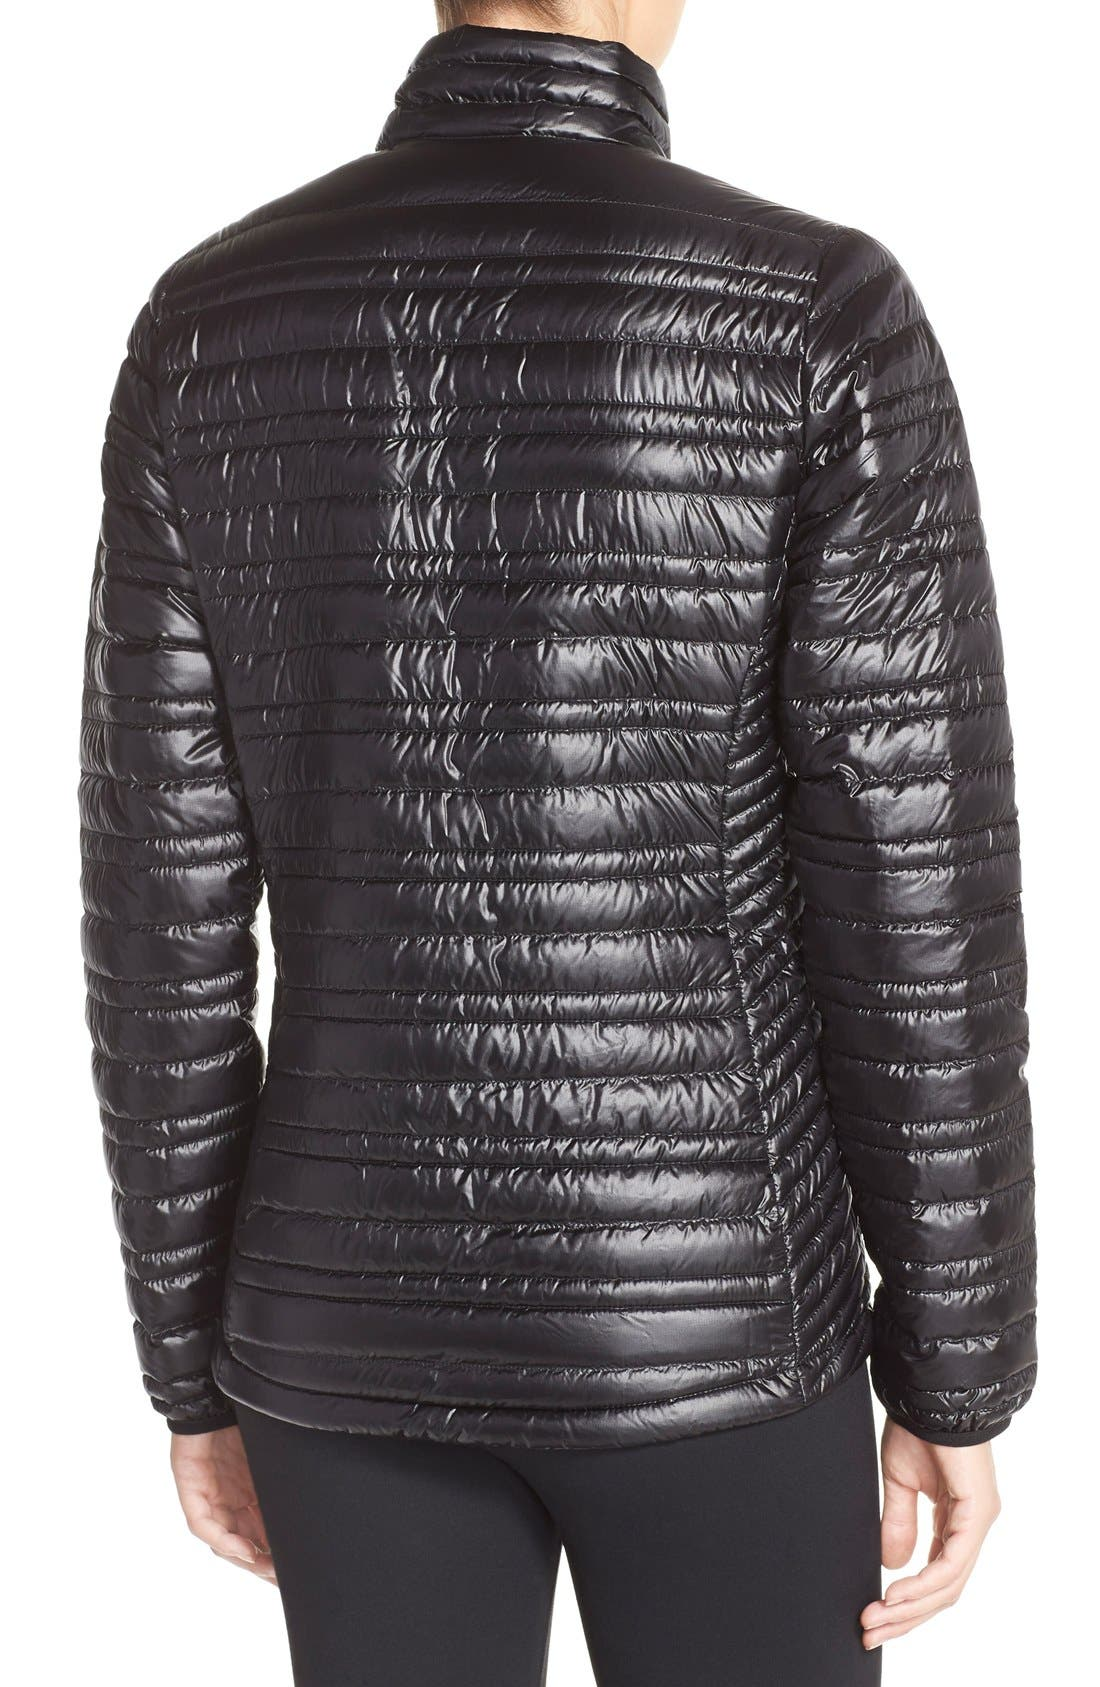 PATAGONIA,                             'Ultralight' Down Puffer Jacket,                             Alternate thumbnail 2, color,                             BLACK